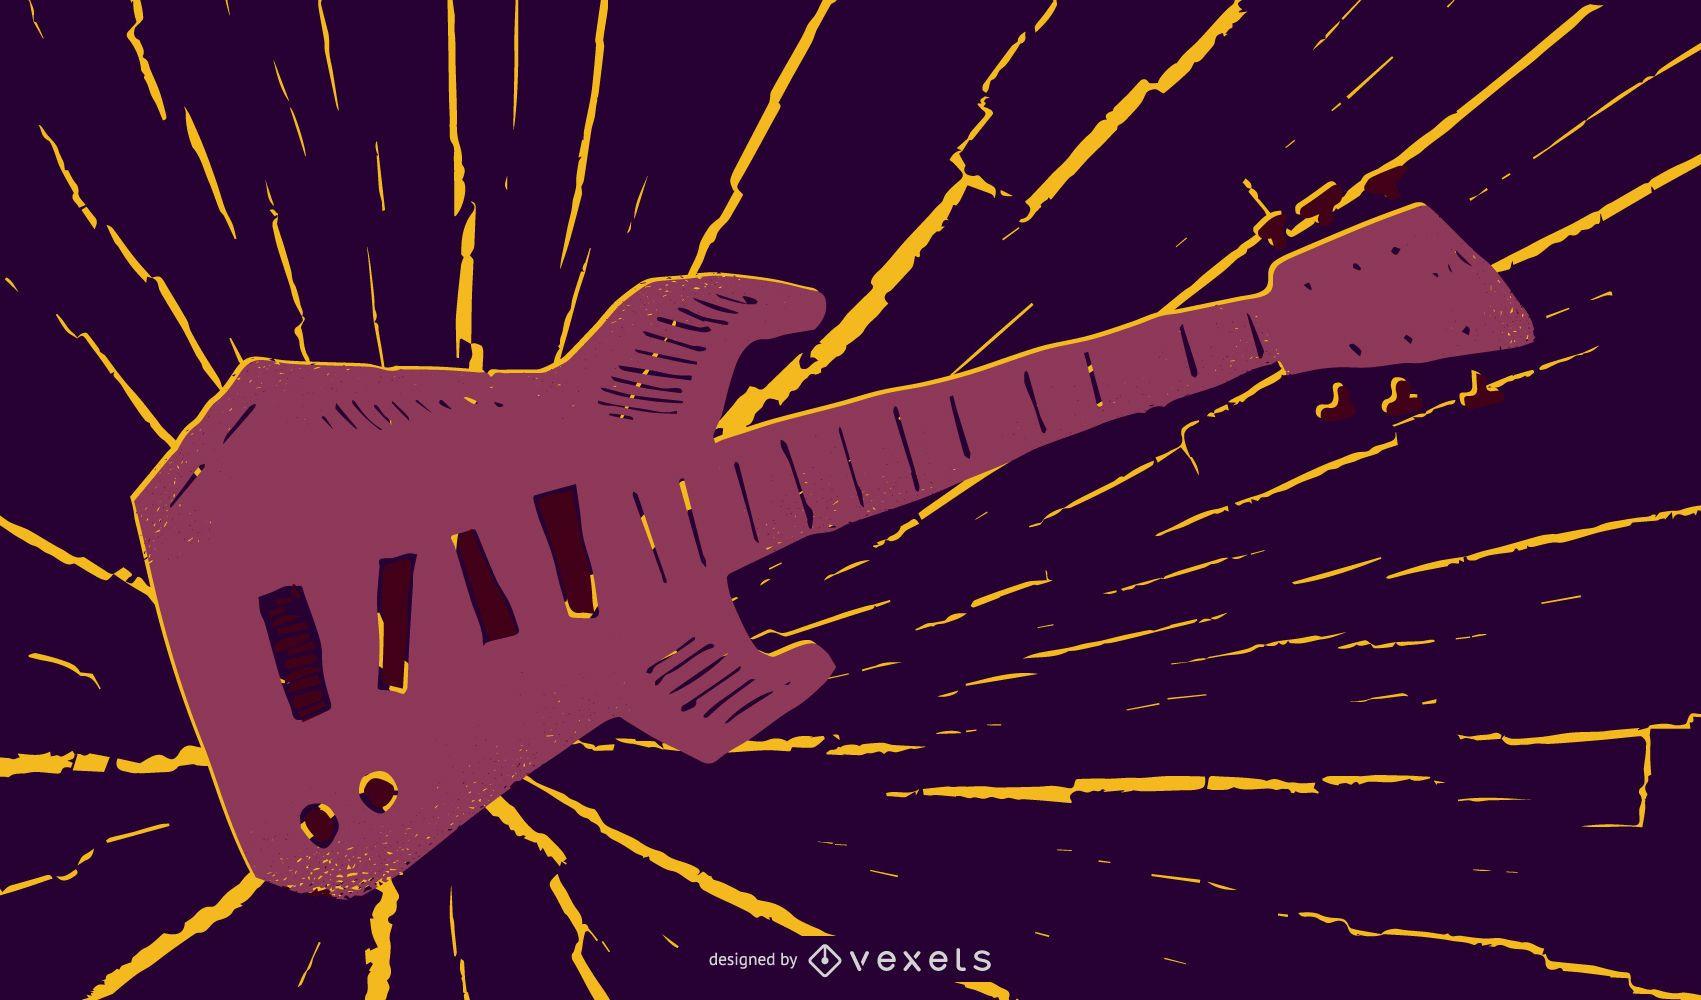 Grungy Guitar Music Illustration